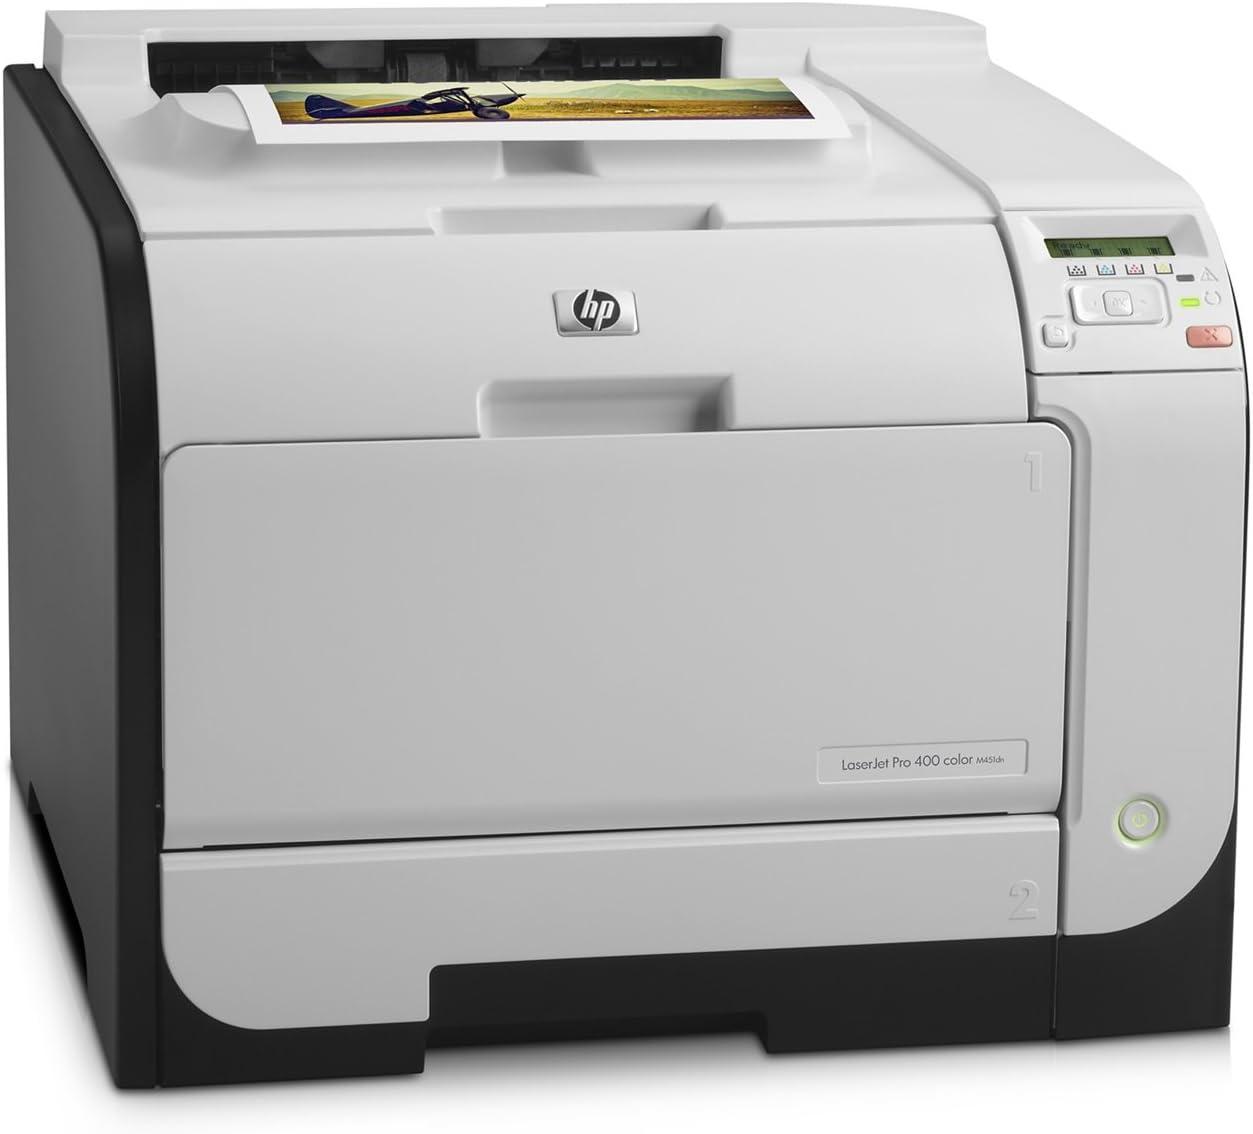 HP LaserJet Pro 400 m451dn Duplex Color Laser Printer